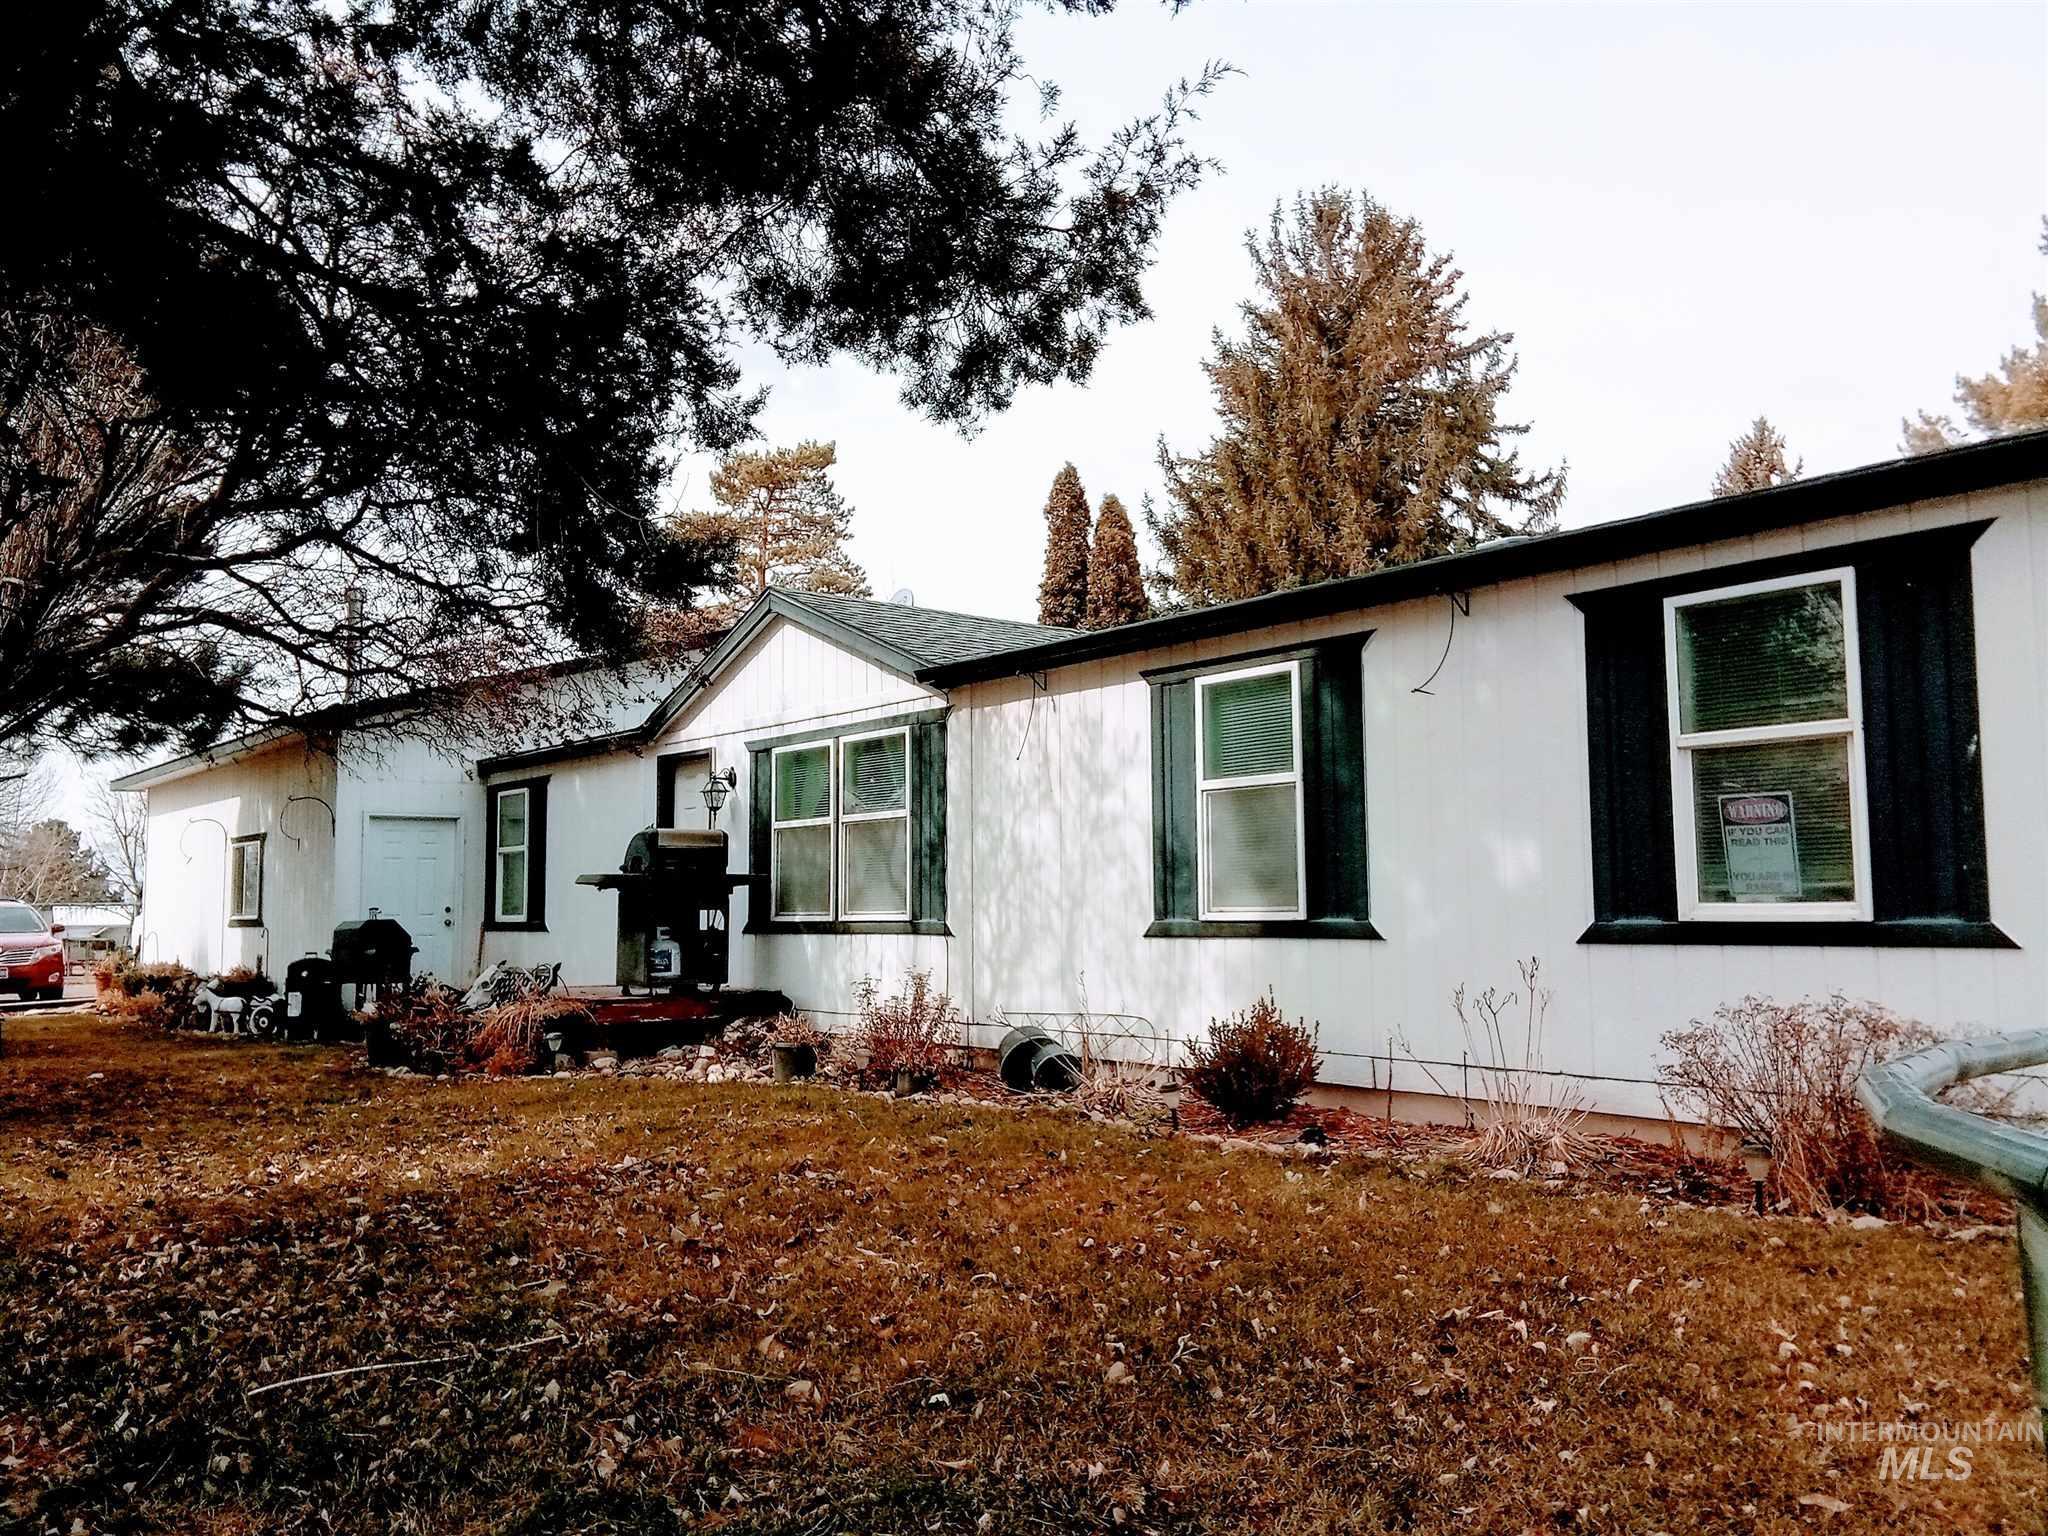 325 E Poplar Property Photo - Hansen, ID real estate listing